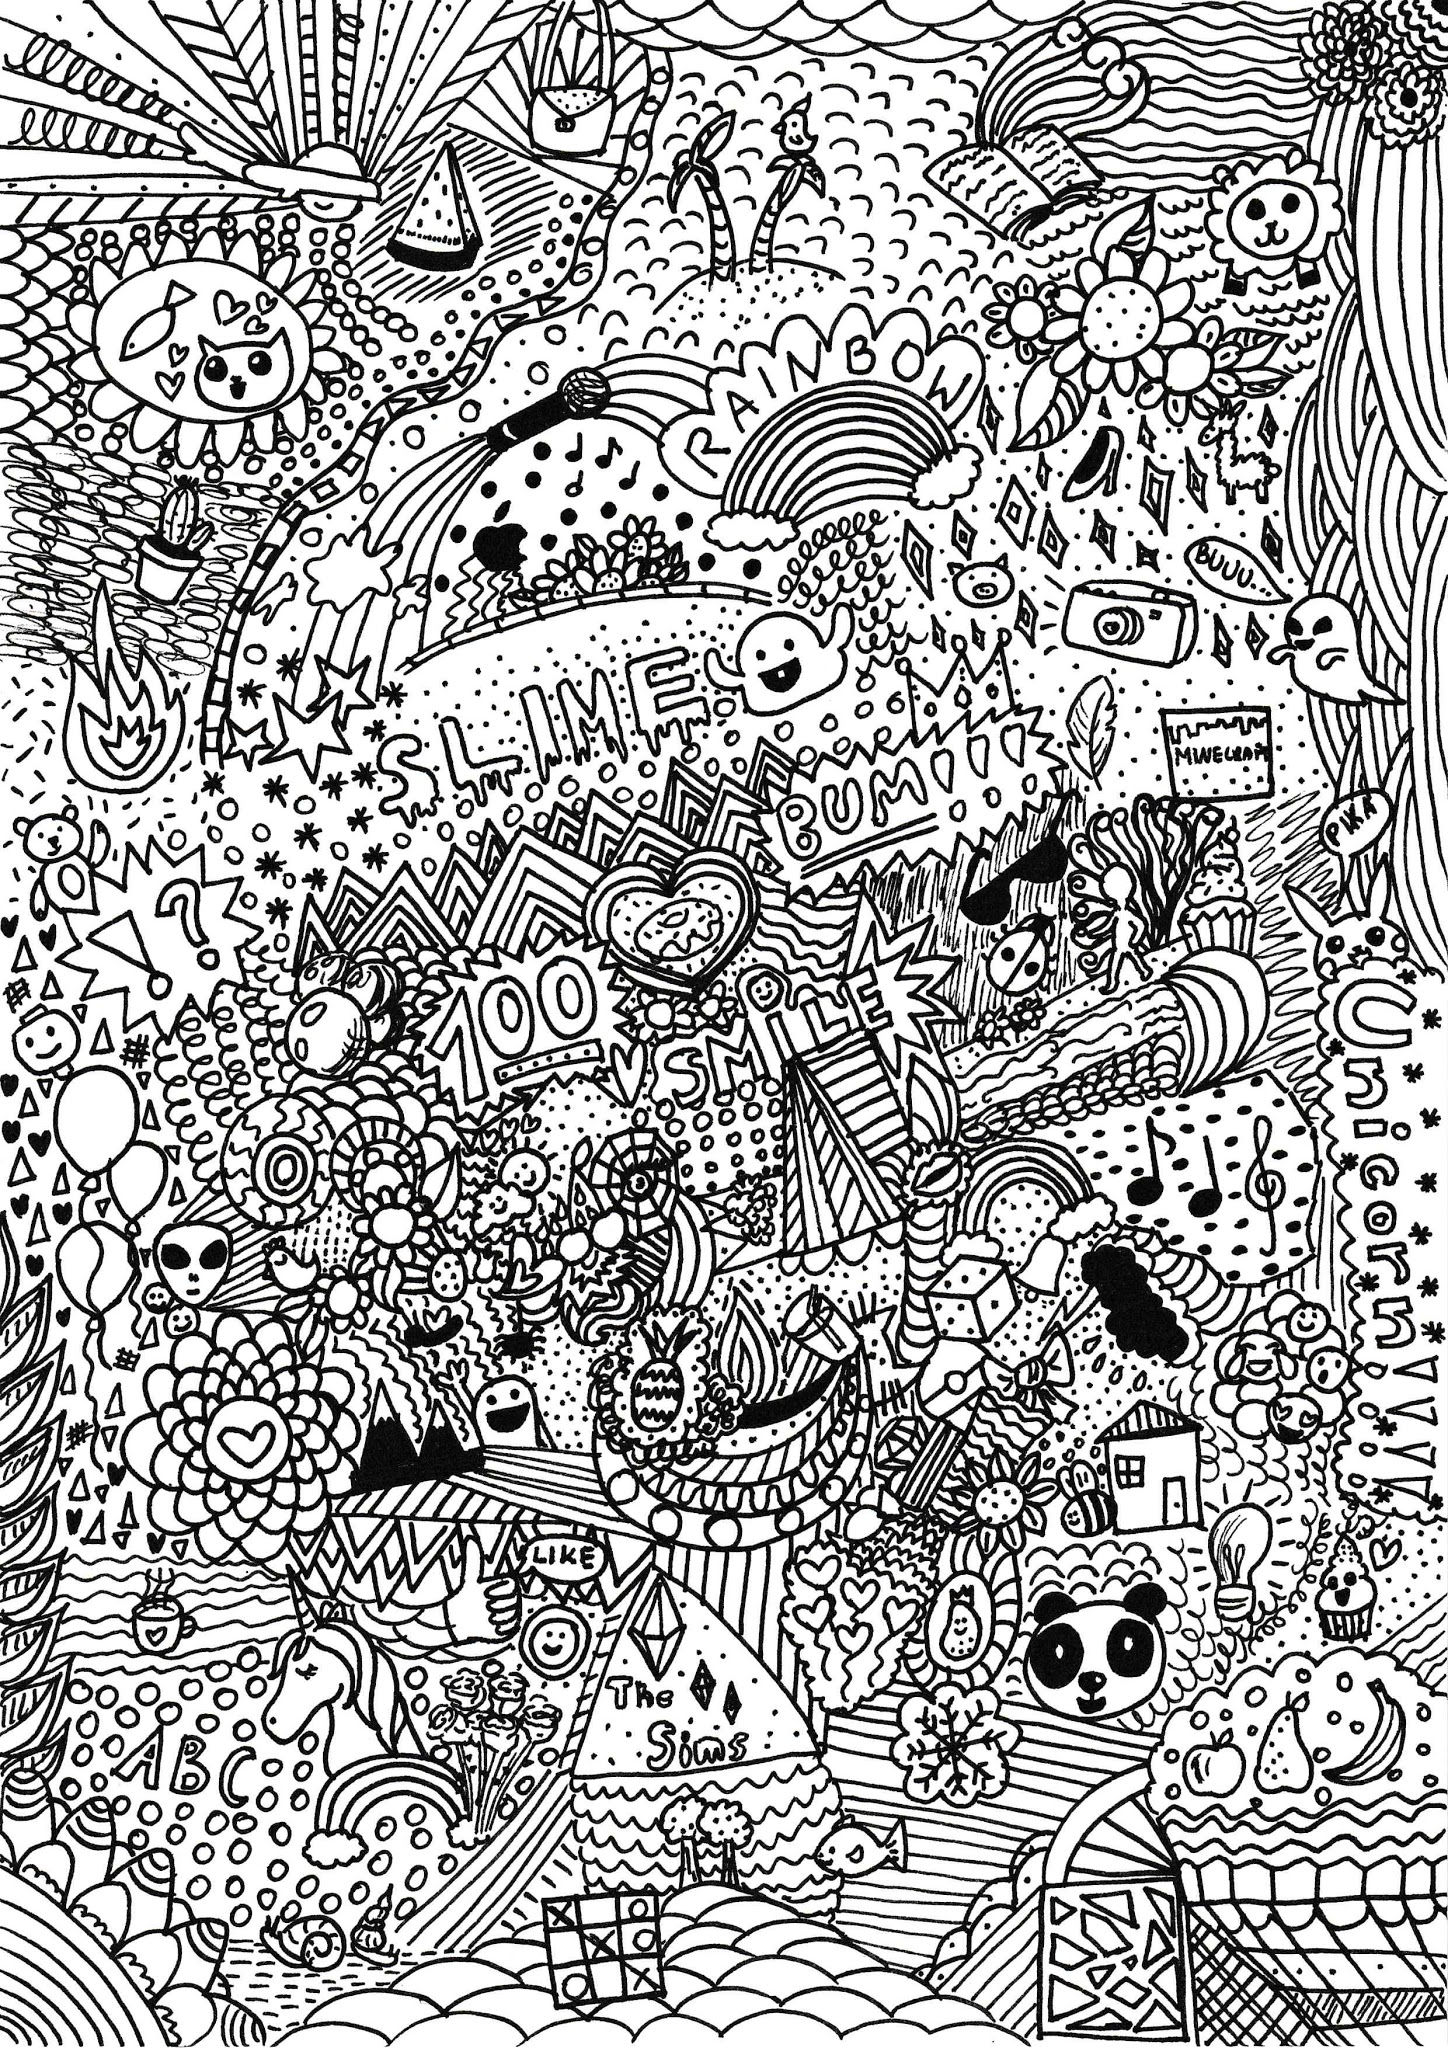 Doodle do pobrania i kolorowania